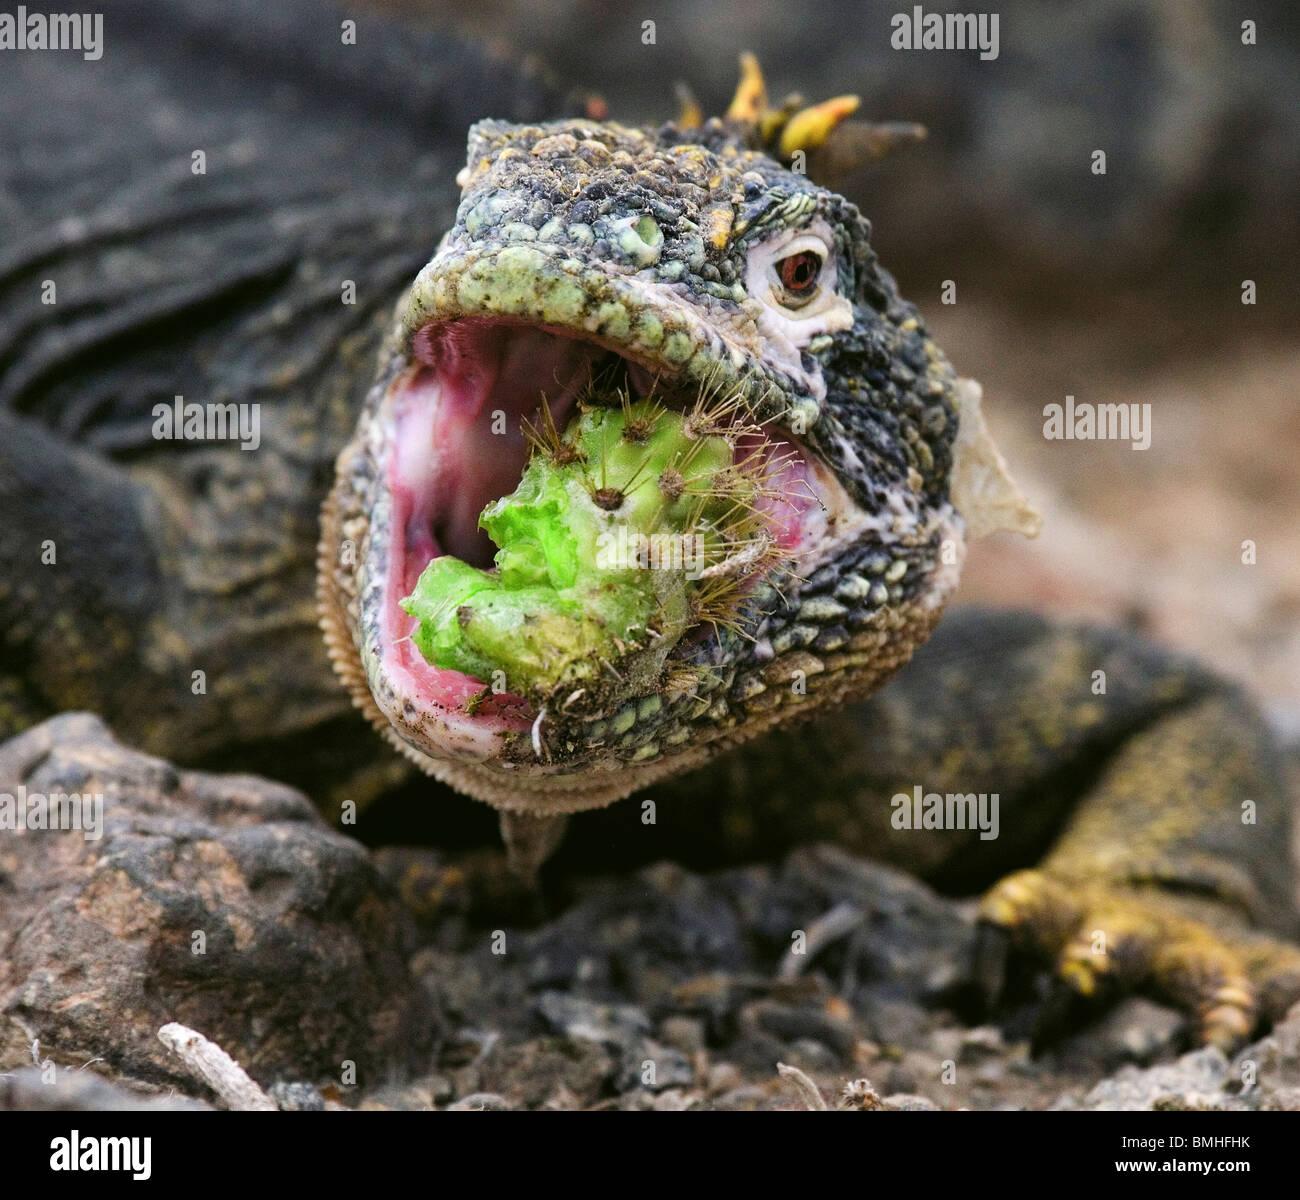 Terrestre (paese) iguana mangiando un cactus, Isola di Santa Fe, Isole Galapagos, Ecuador. Immagini Stock